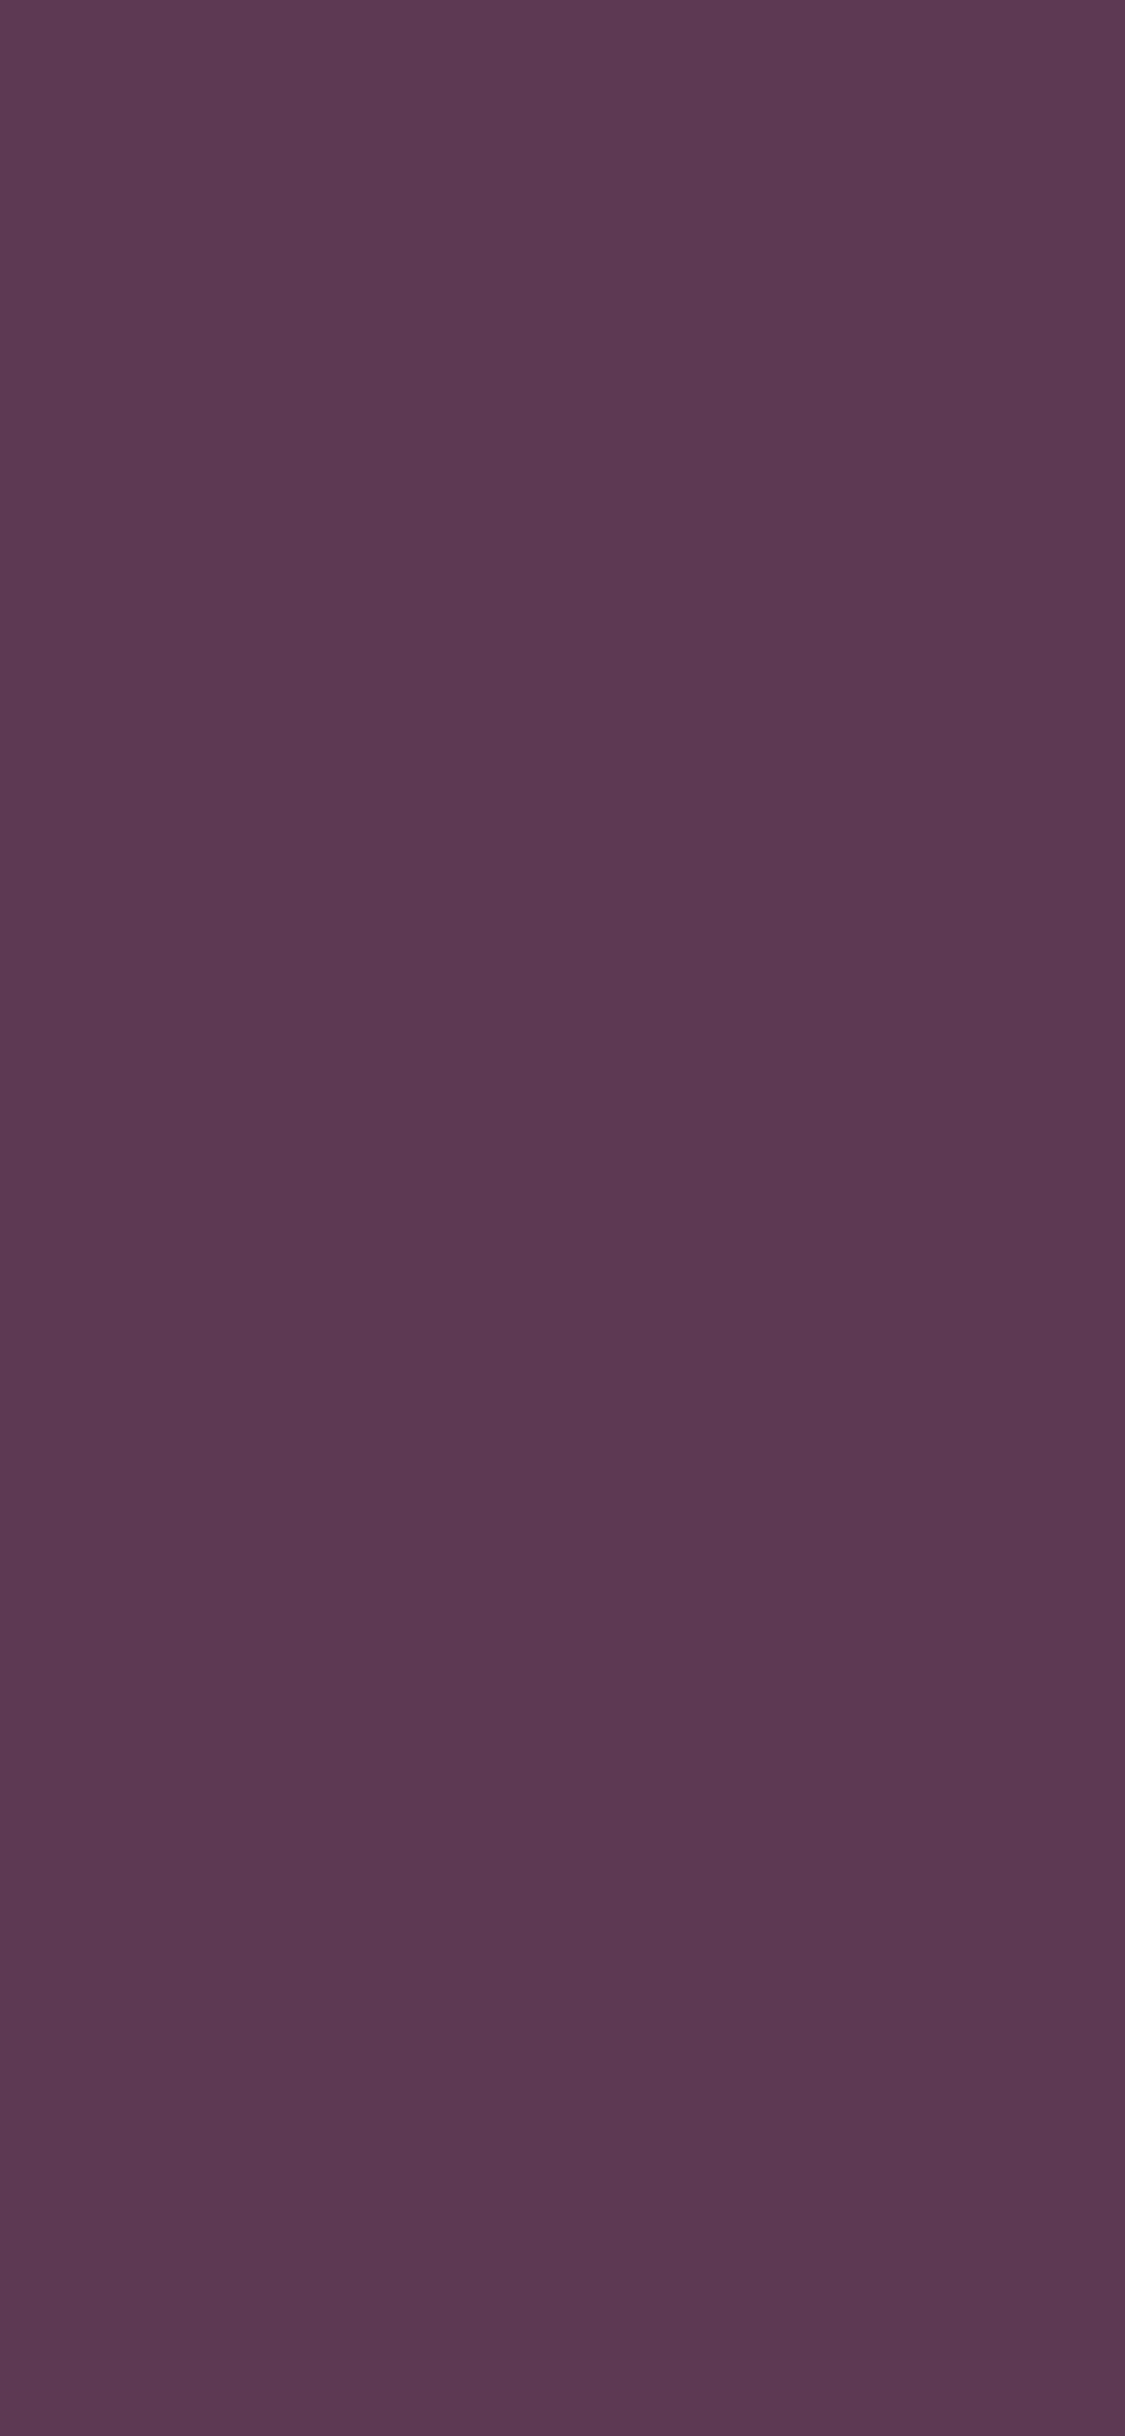 1125x2436 Dark Byzantium Solid Color Background